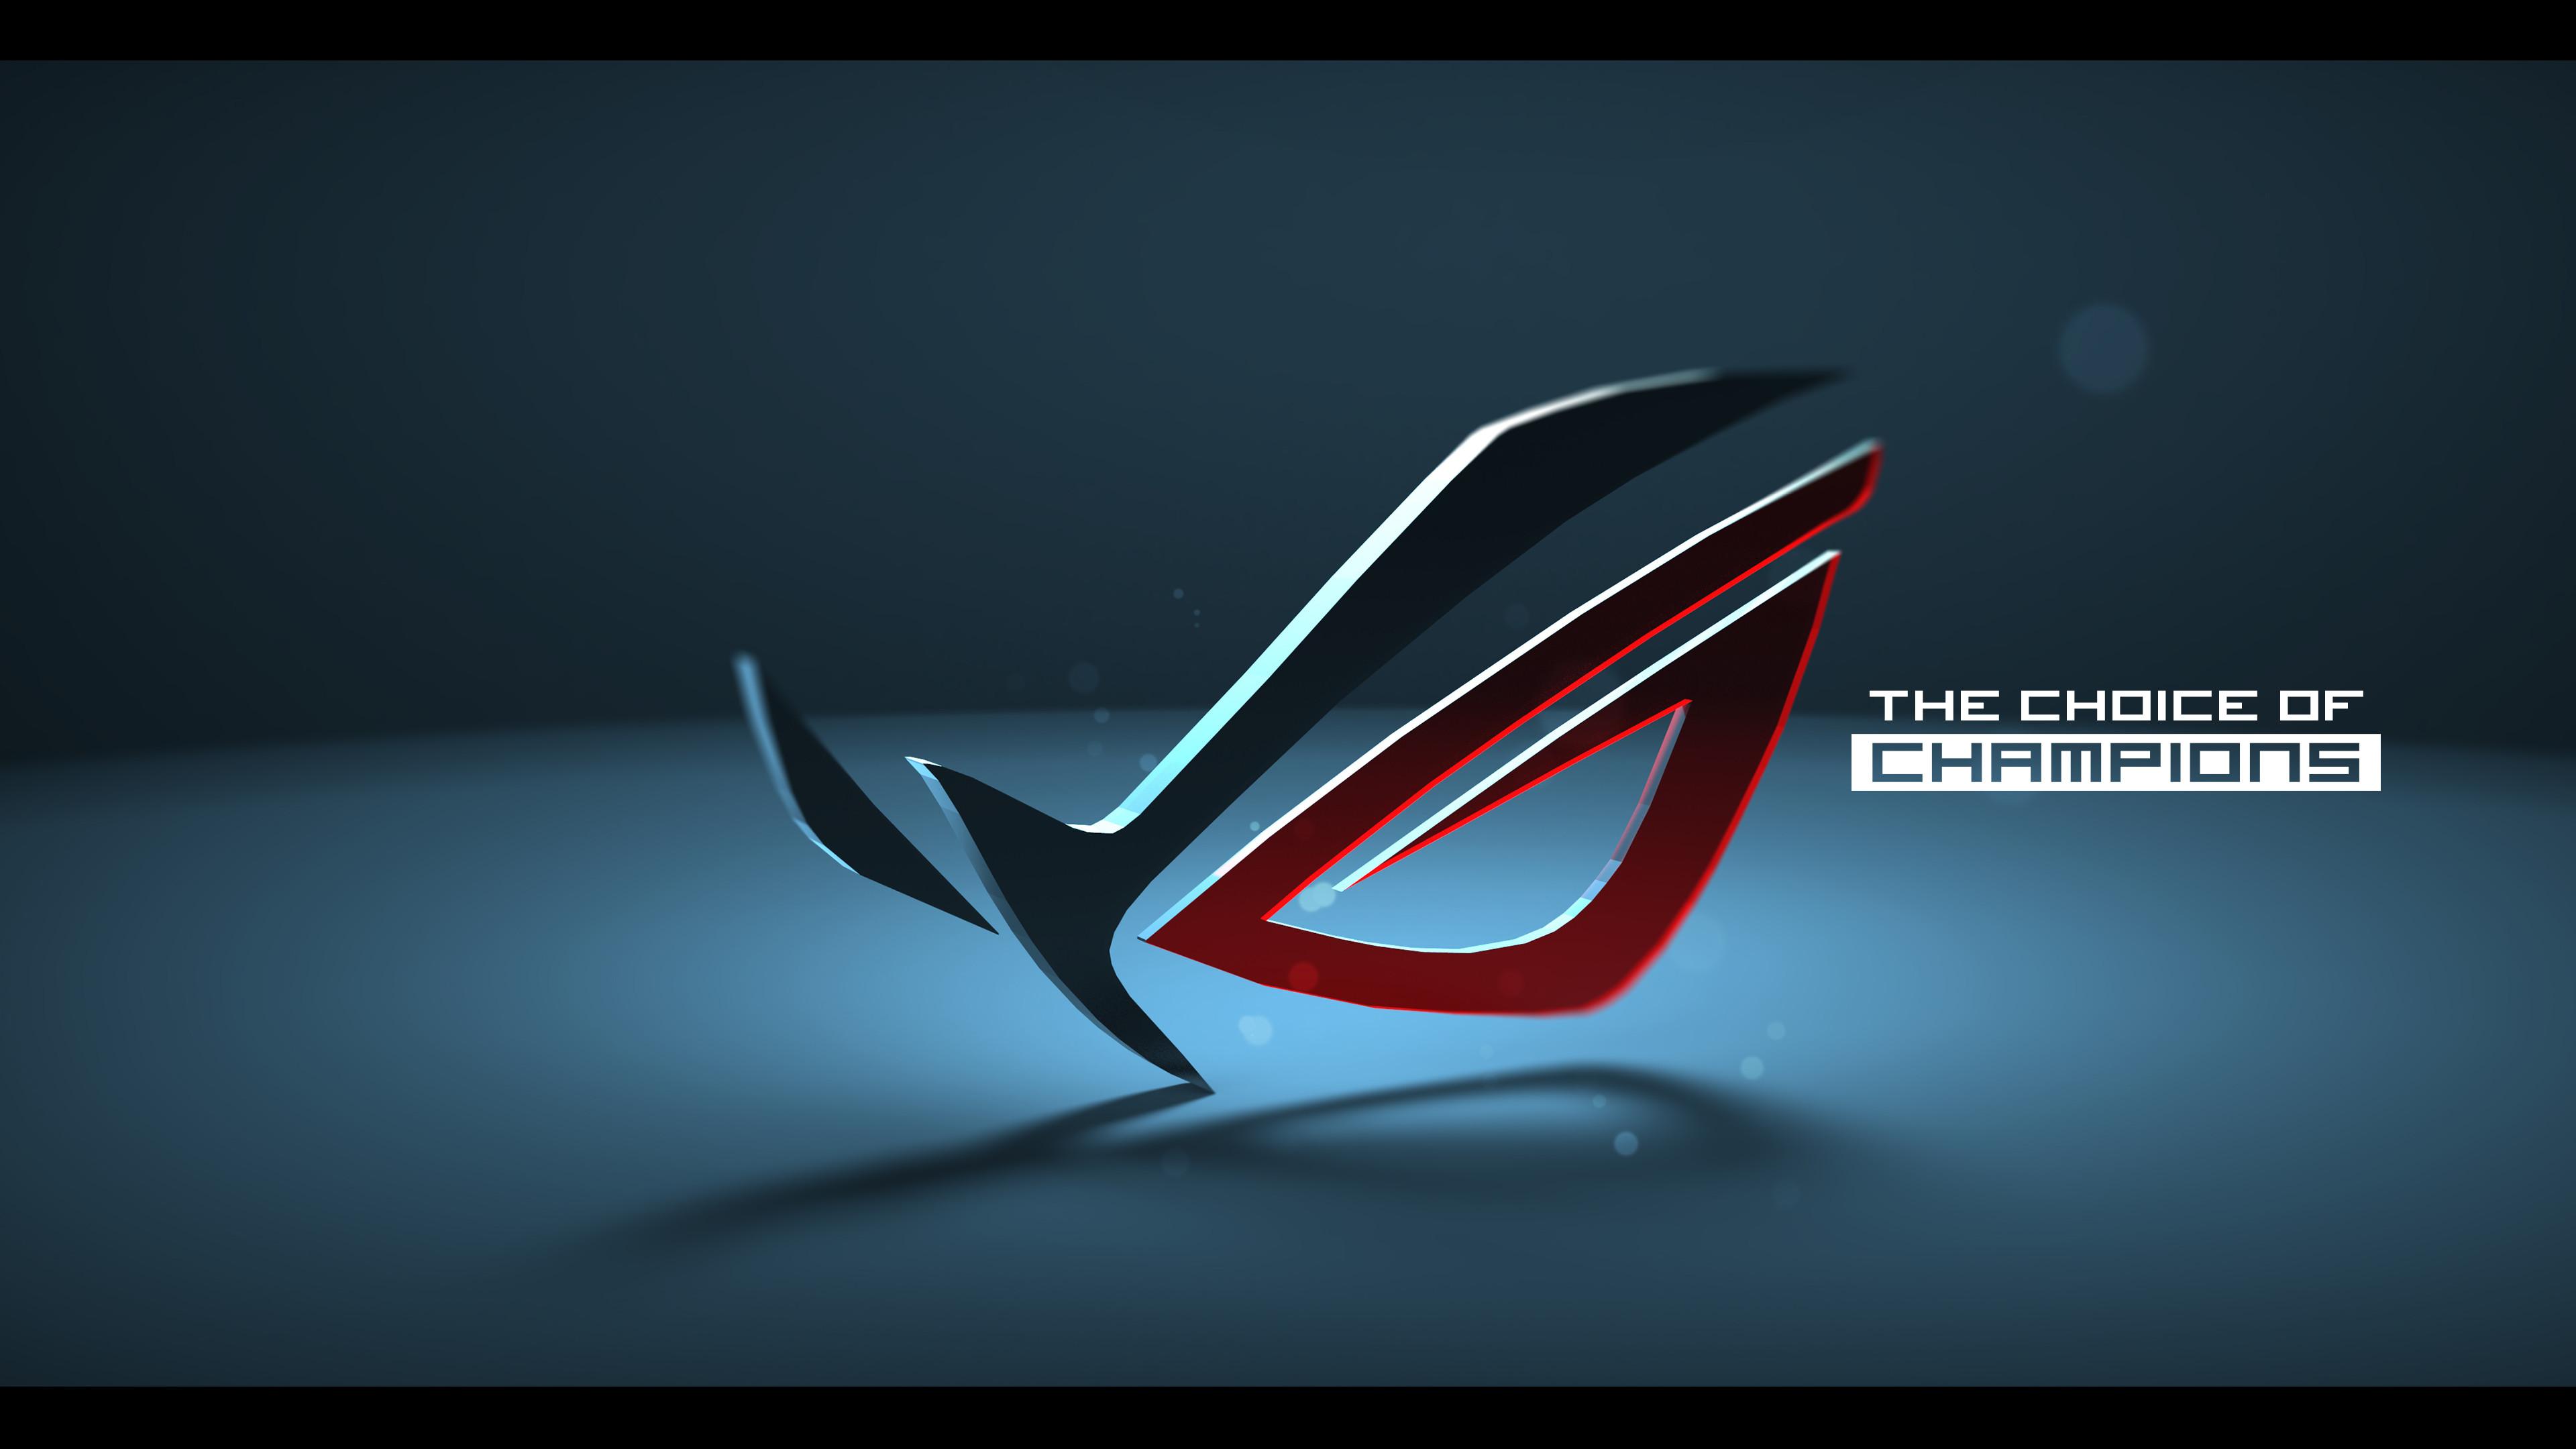 3d logo asus original 4k wallpaper ultra hd | View HD